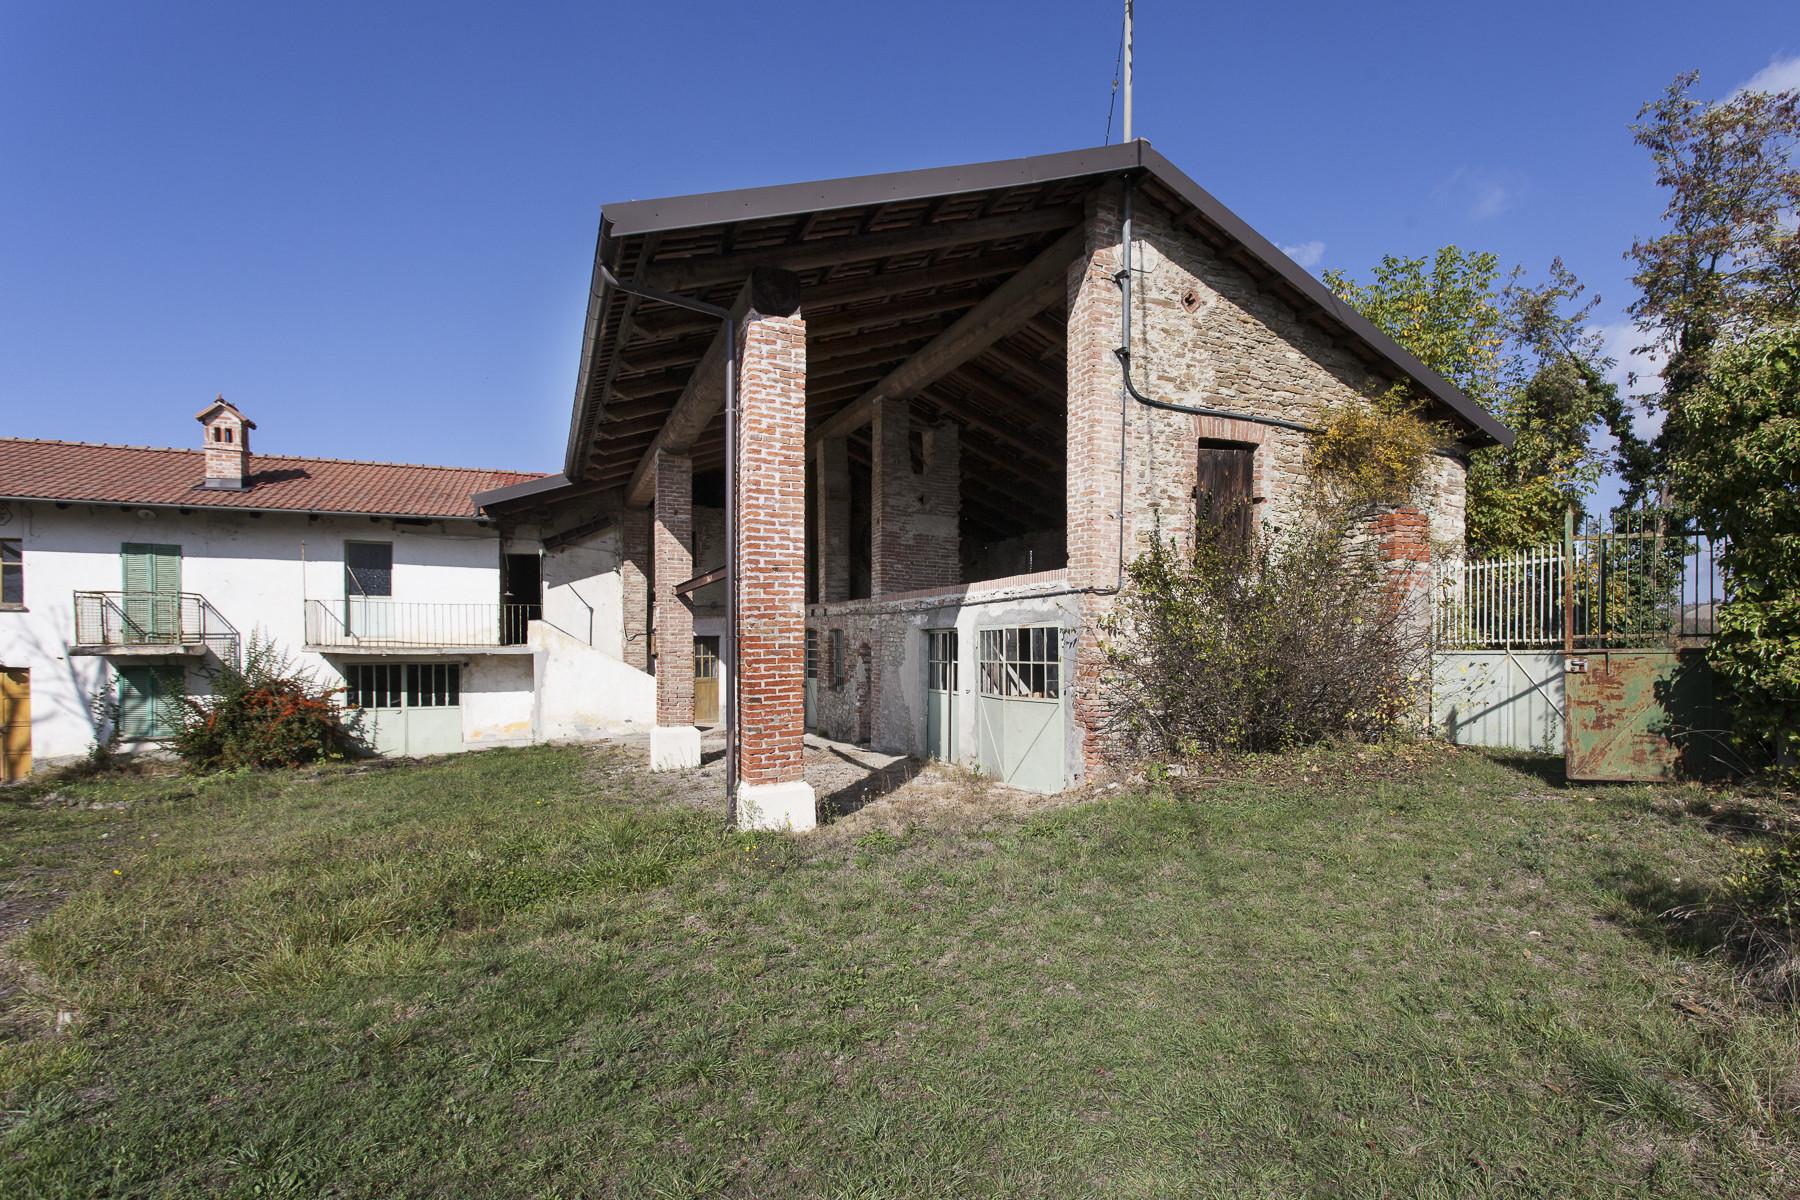 Villa in Vendita a Clavesana: 5 locali, 1130 mq - Foto 16